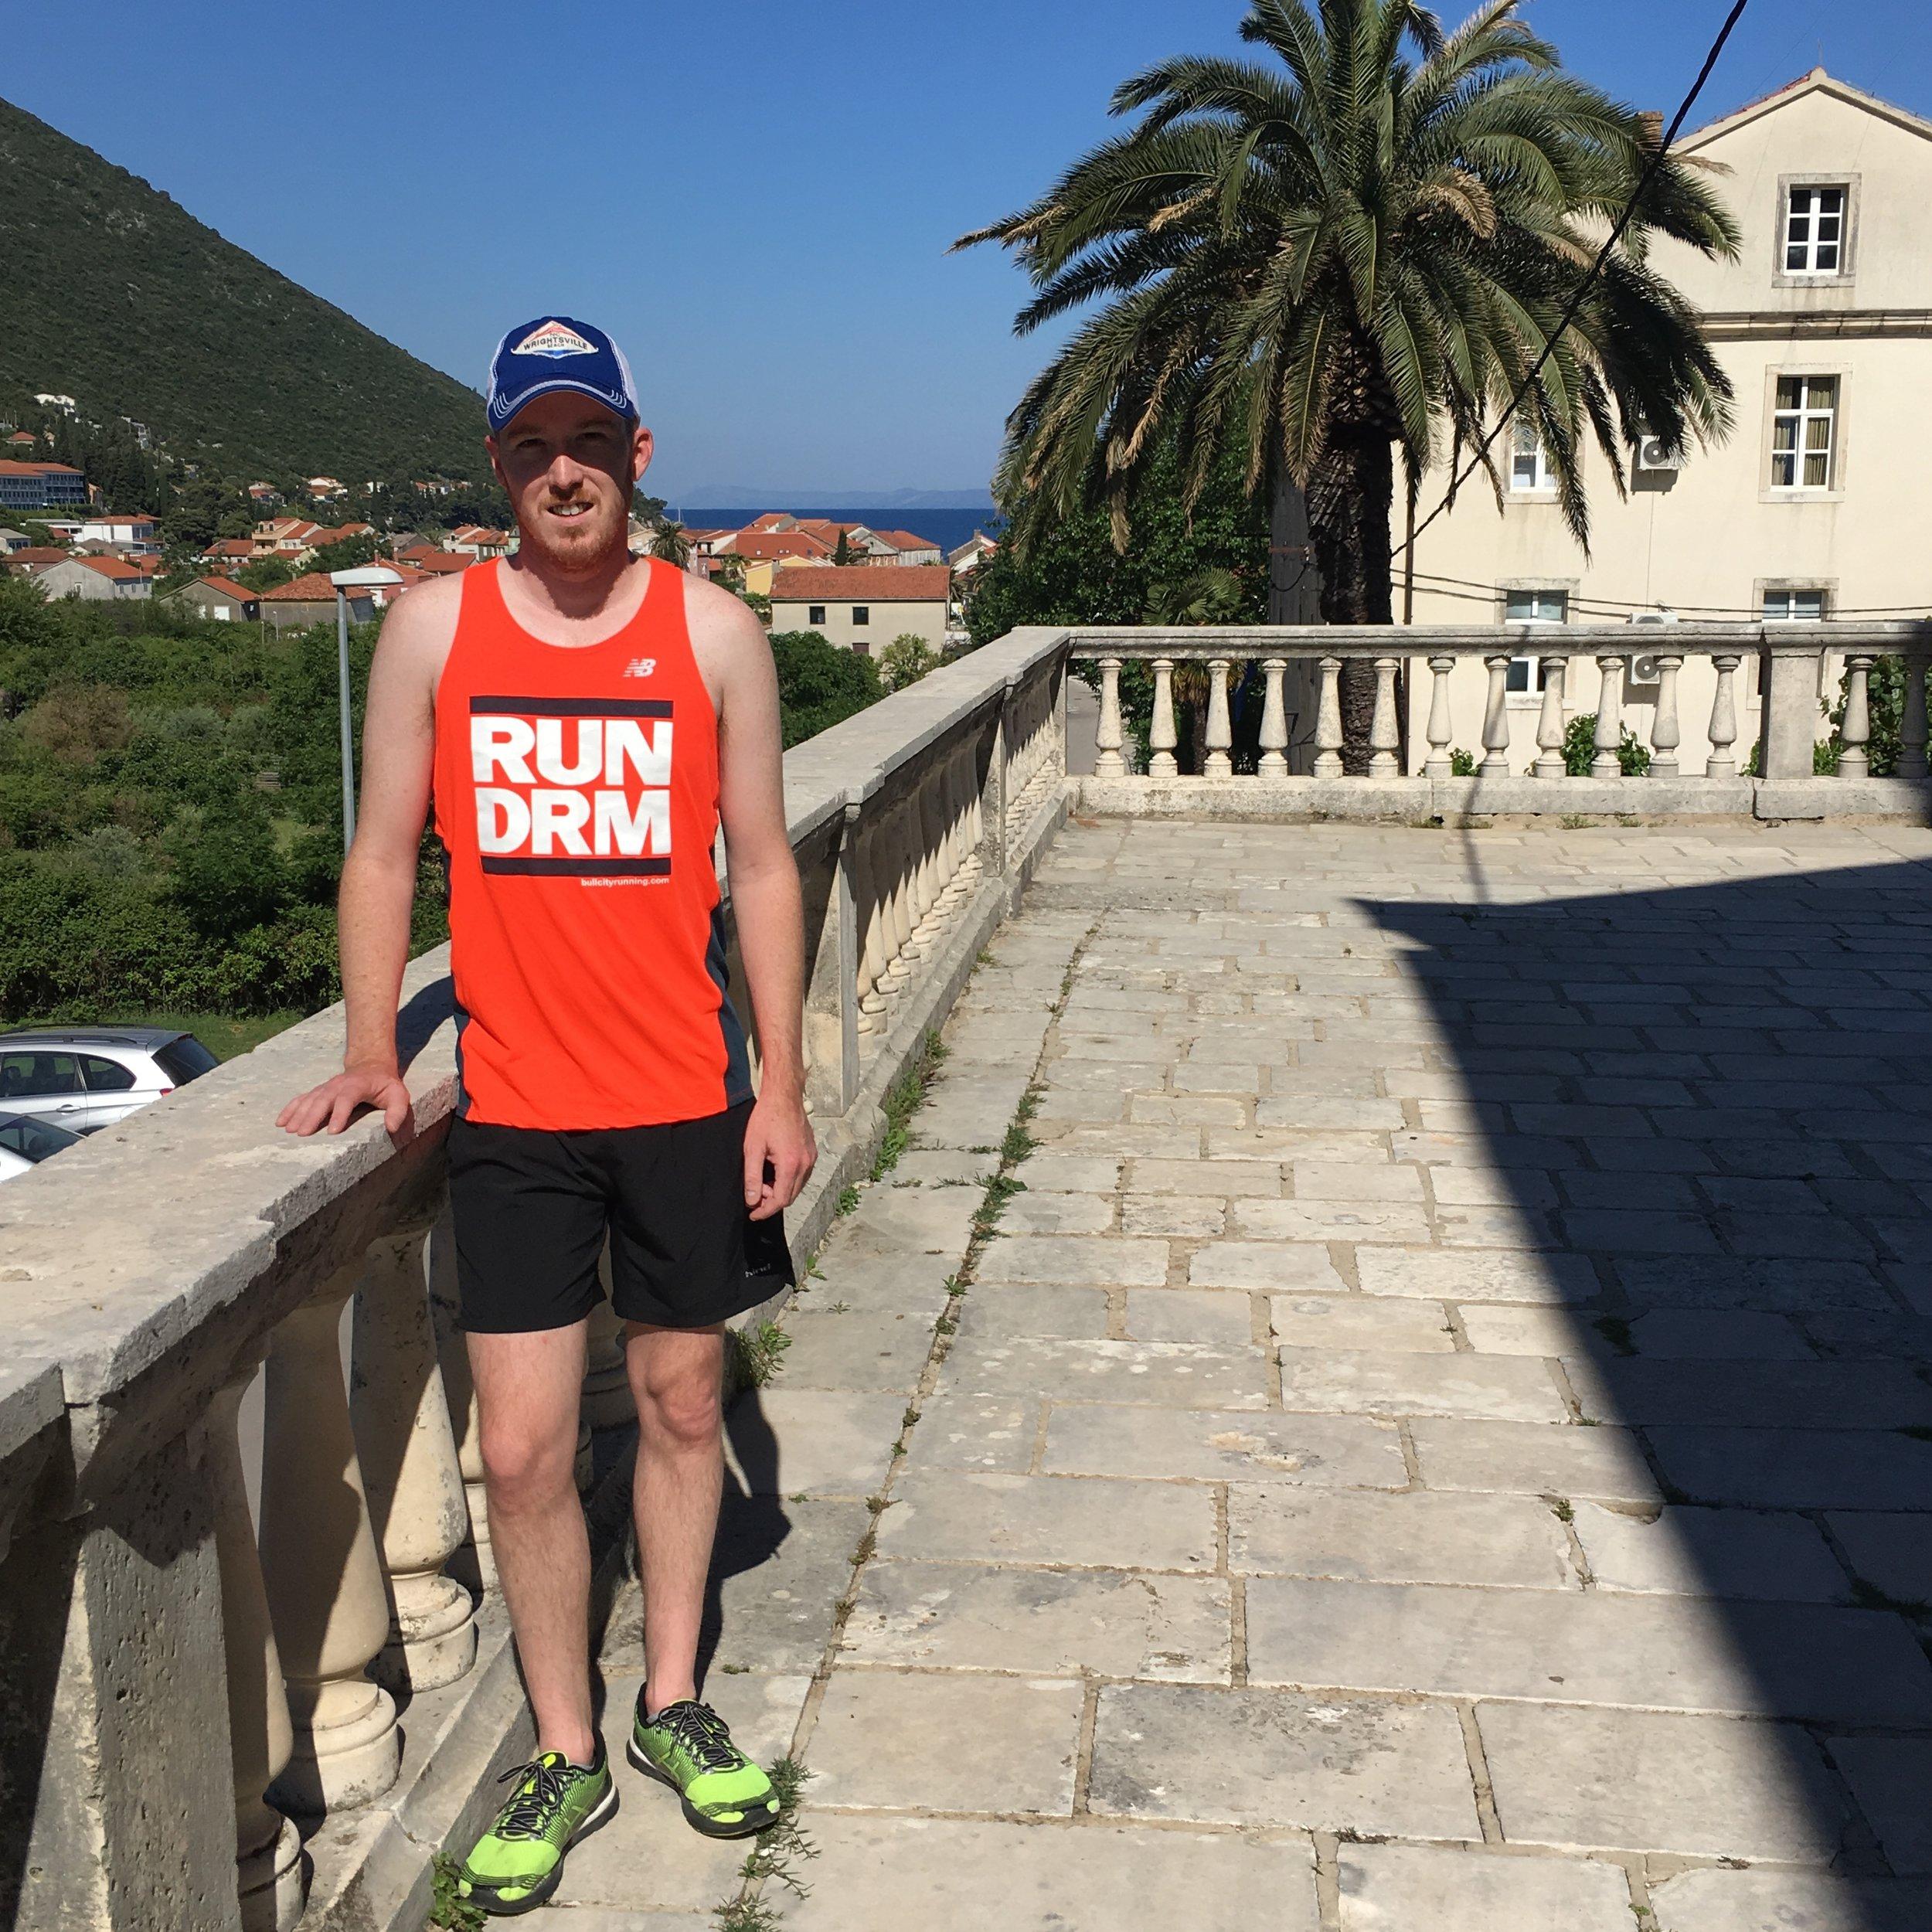 Post-run in Trpanj, Croatia.